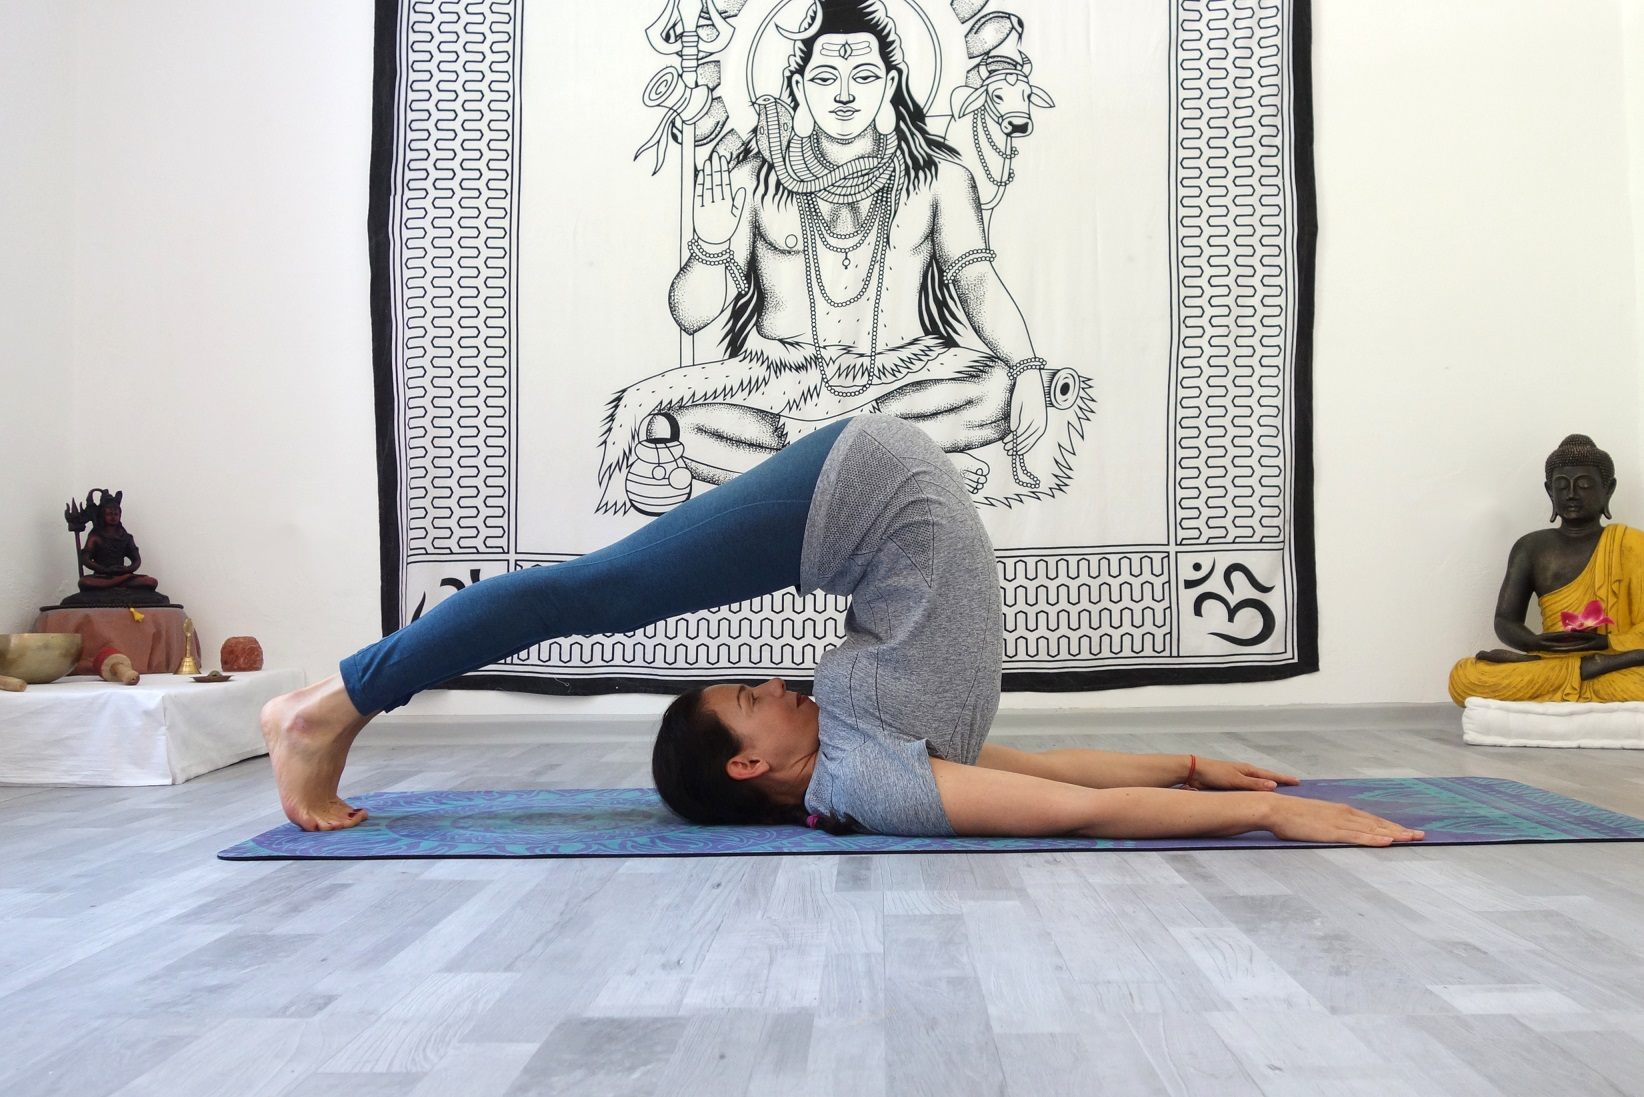 petra k 5 - Yoga für ein starkes Immunsystem